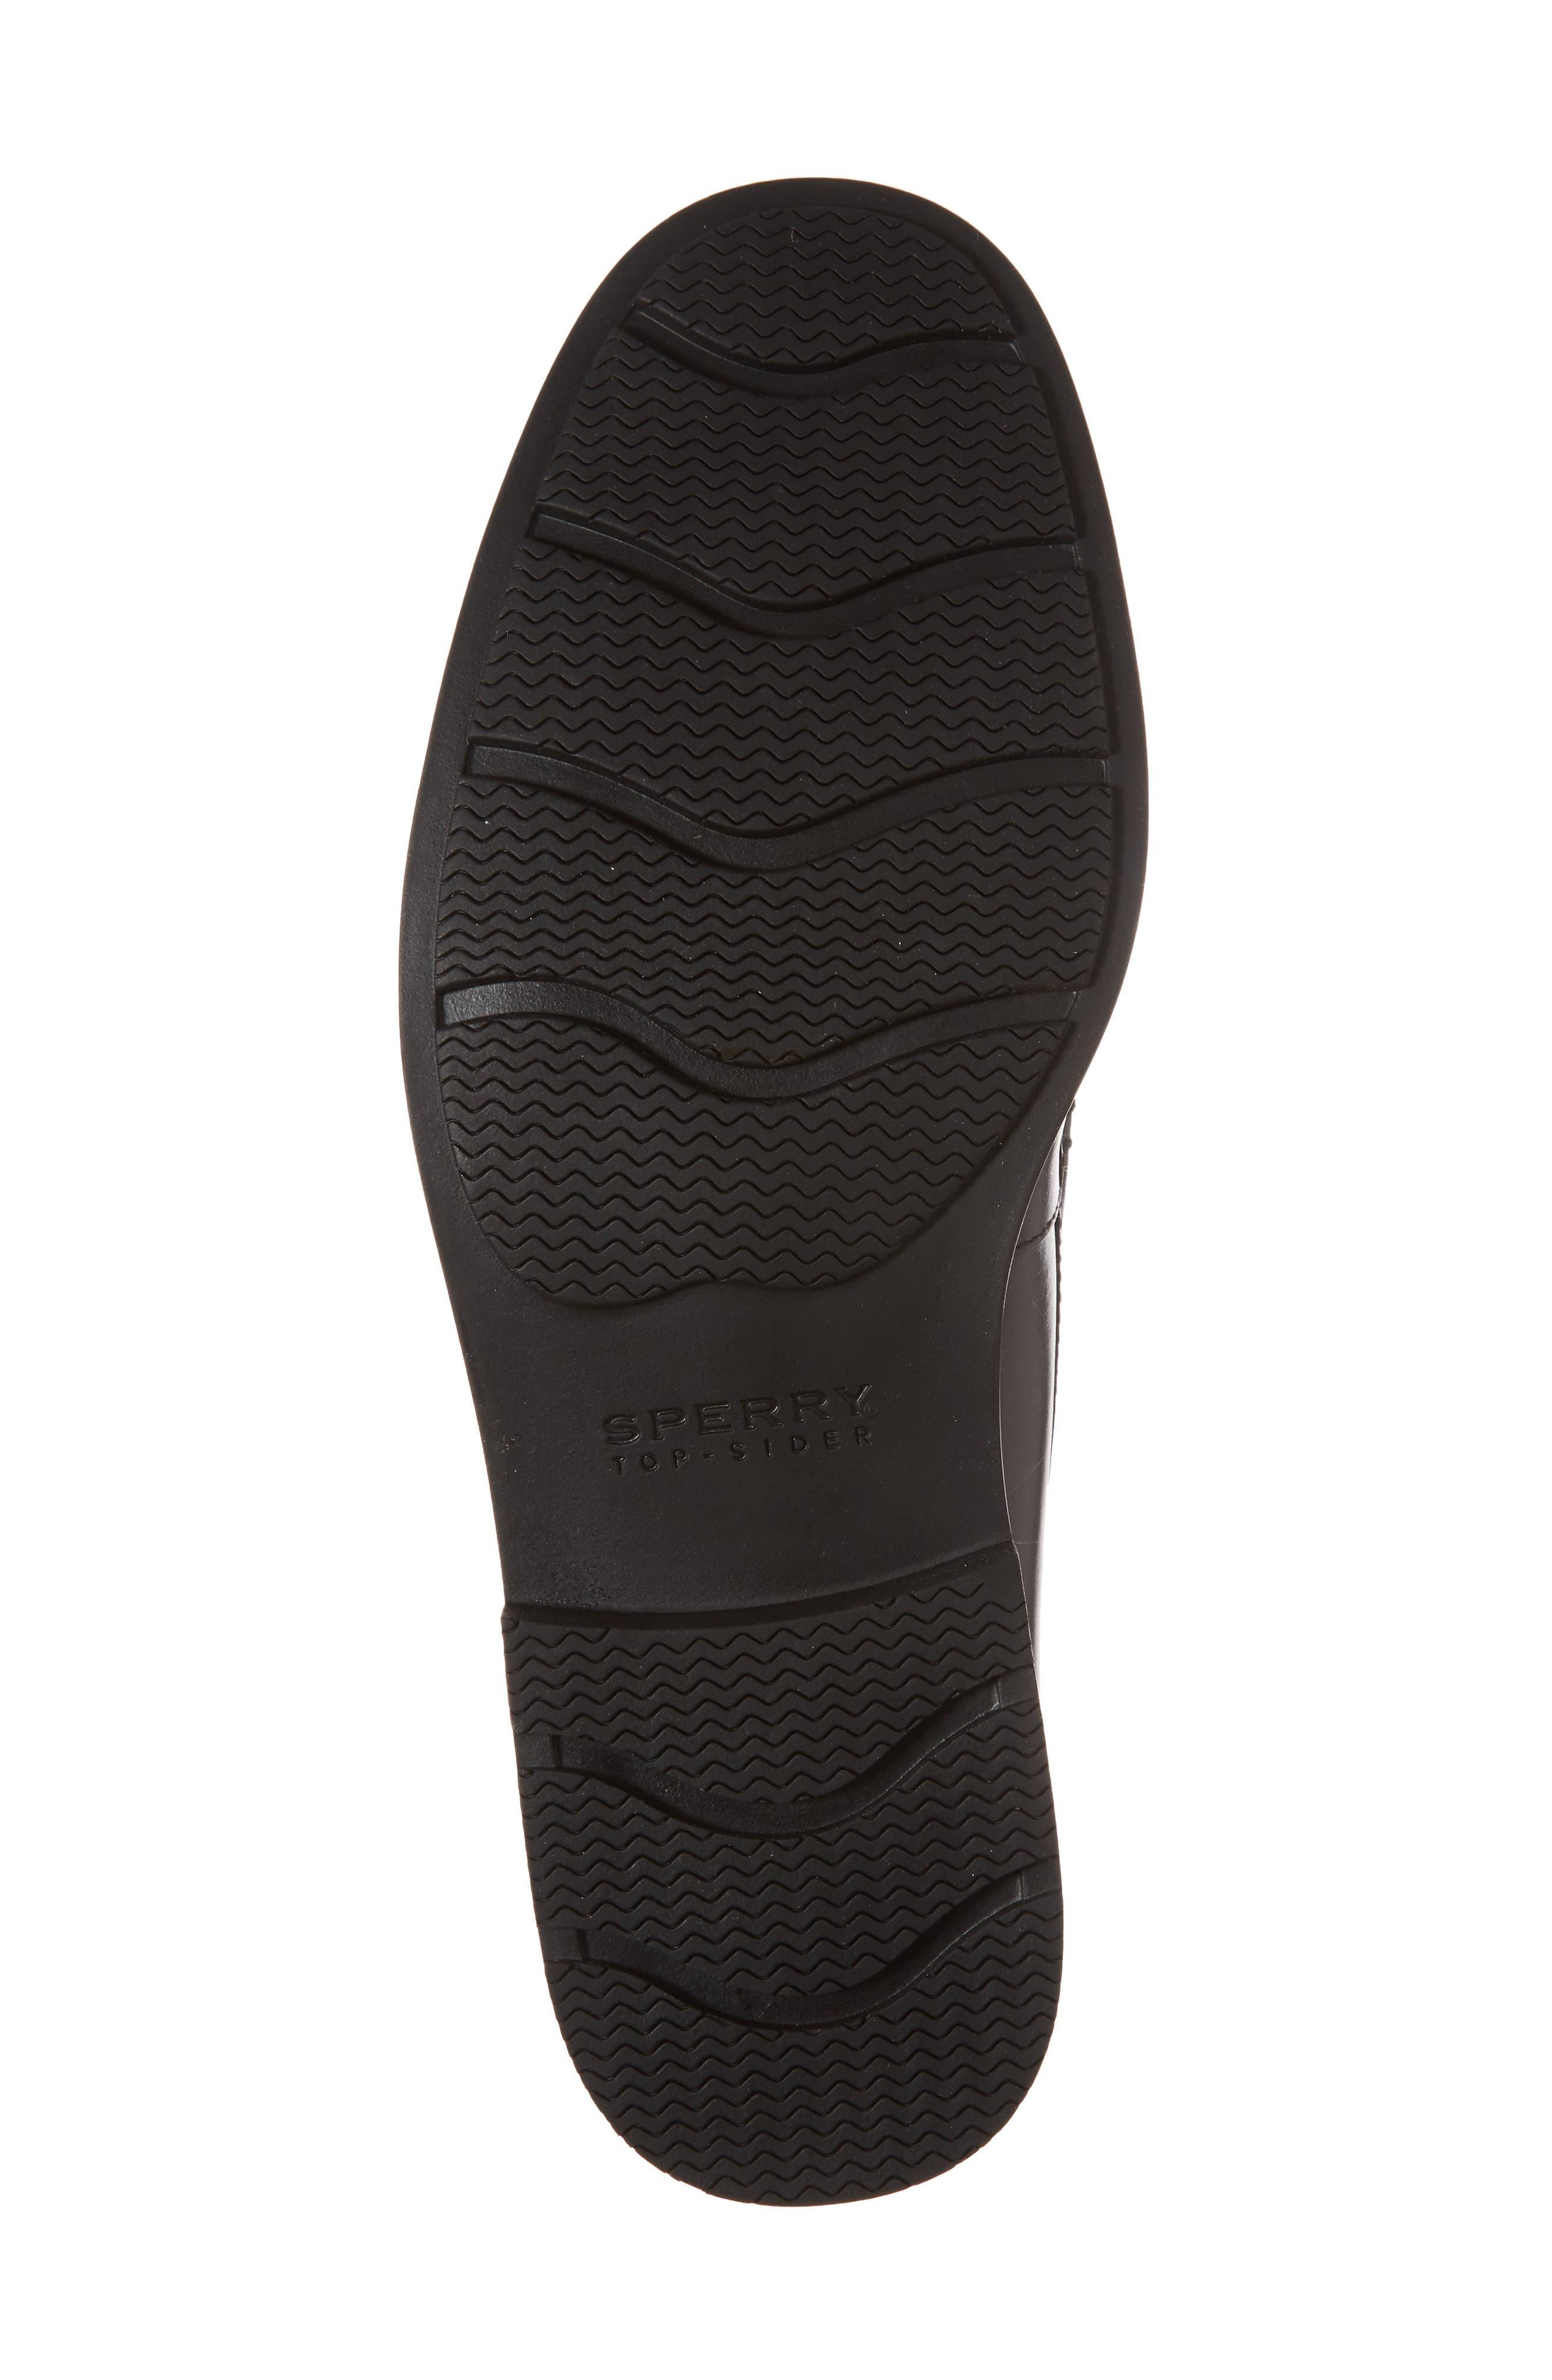 Essex Venetian Loafer,                             Alternate thumbnail 6, color,                             Black Leather